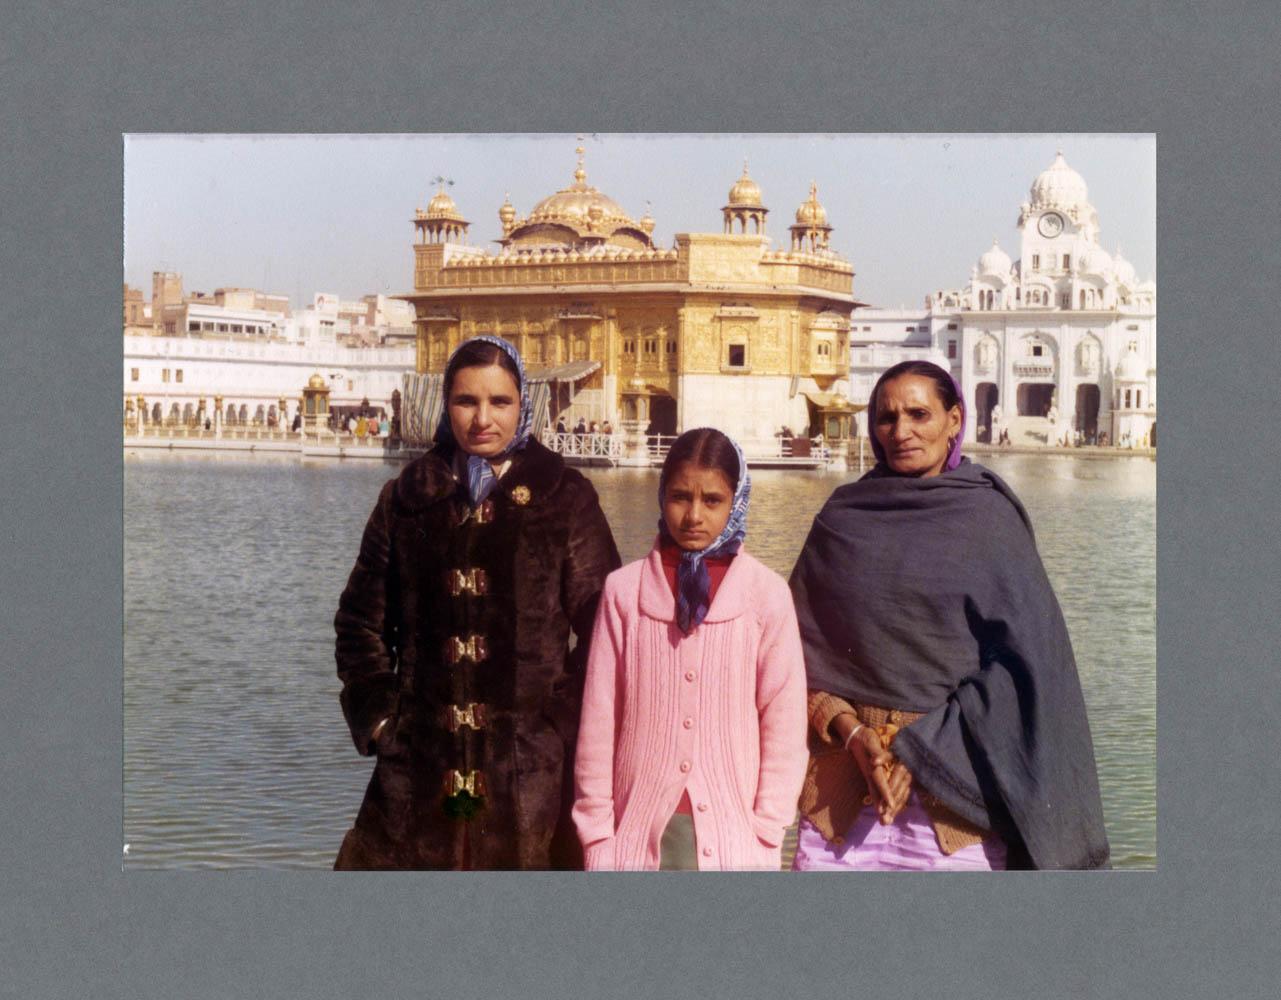 Golden Temple, Amritsar, Punjab c.1978